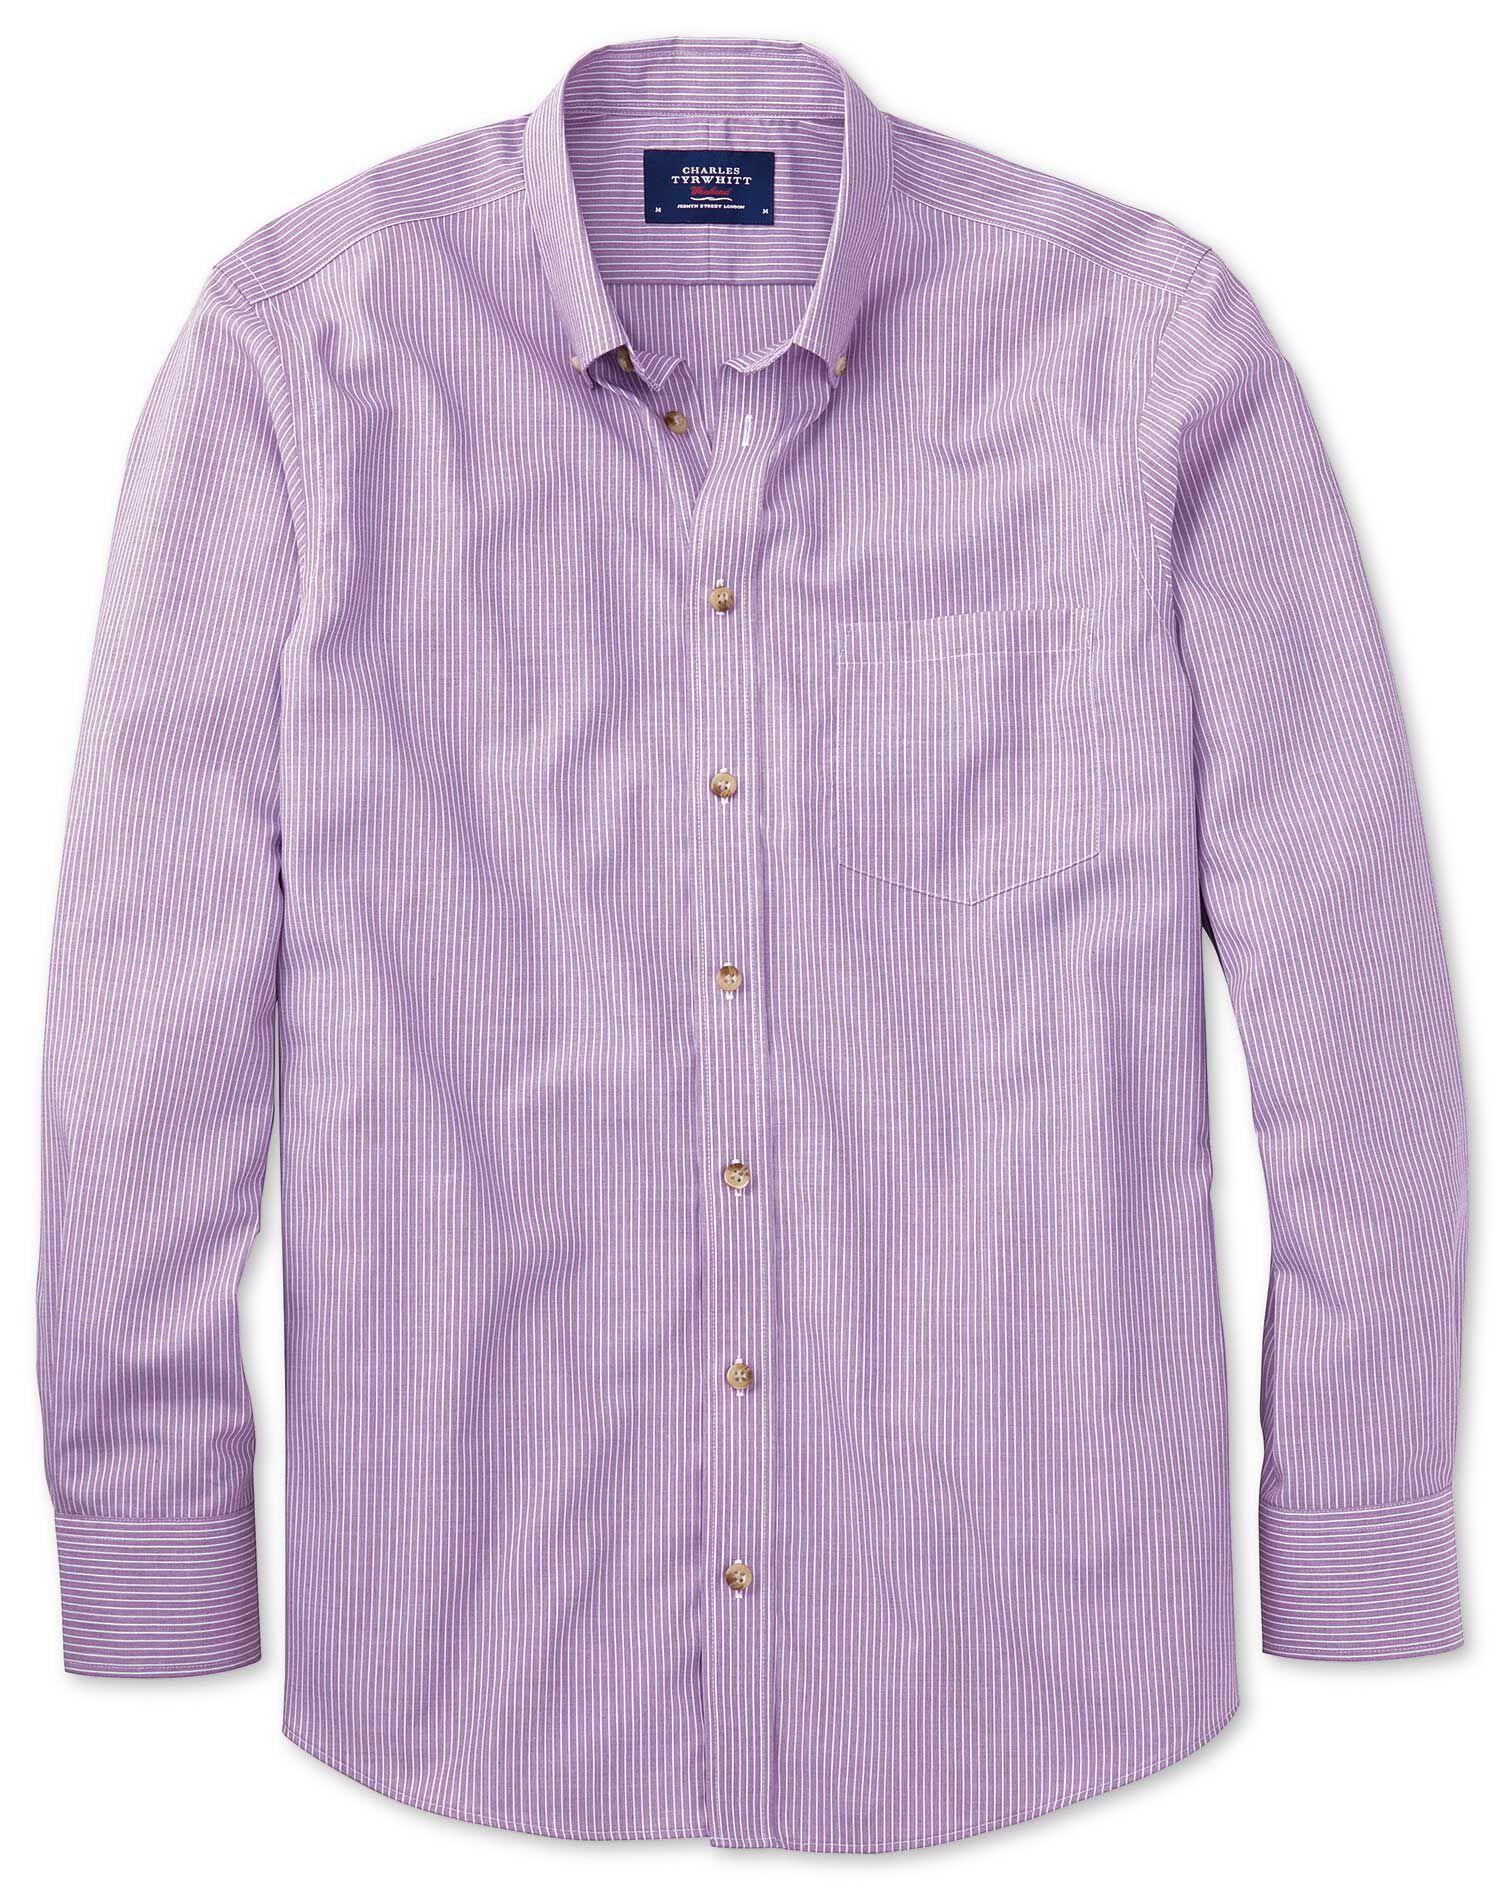 Classic Fit Non-Iron Poplin Lilac Stripe Cotton Shirt Single Cuff Size XL by Charles Tyrwhitt